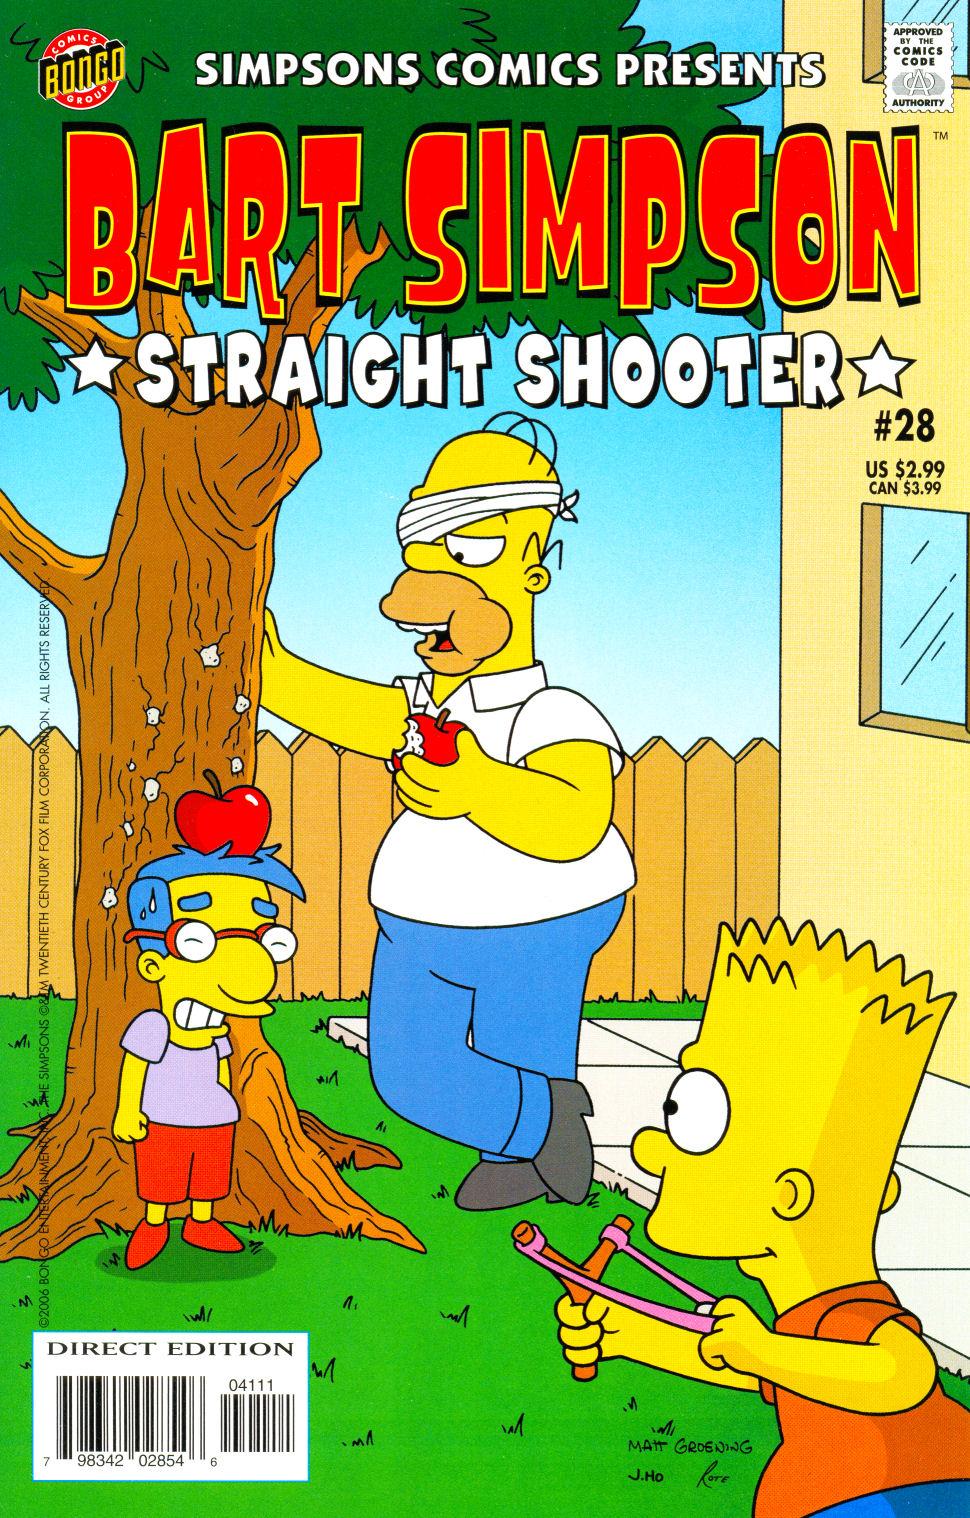 Simpsons Comics Presents Bart Simpson 28 Page 1